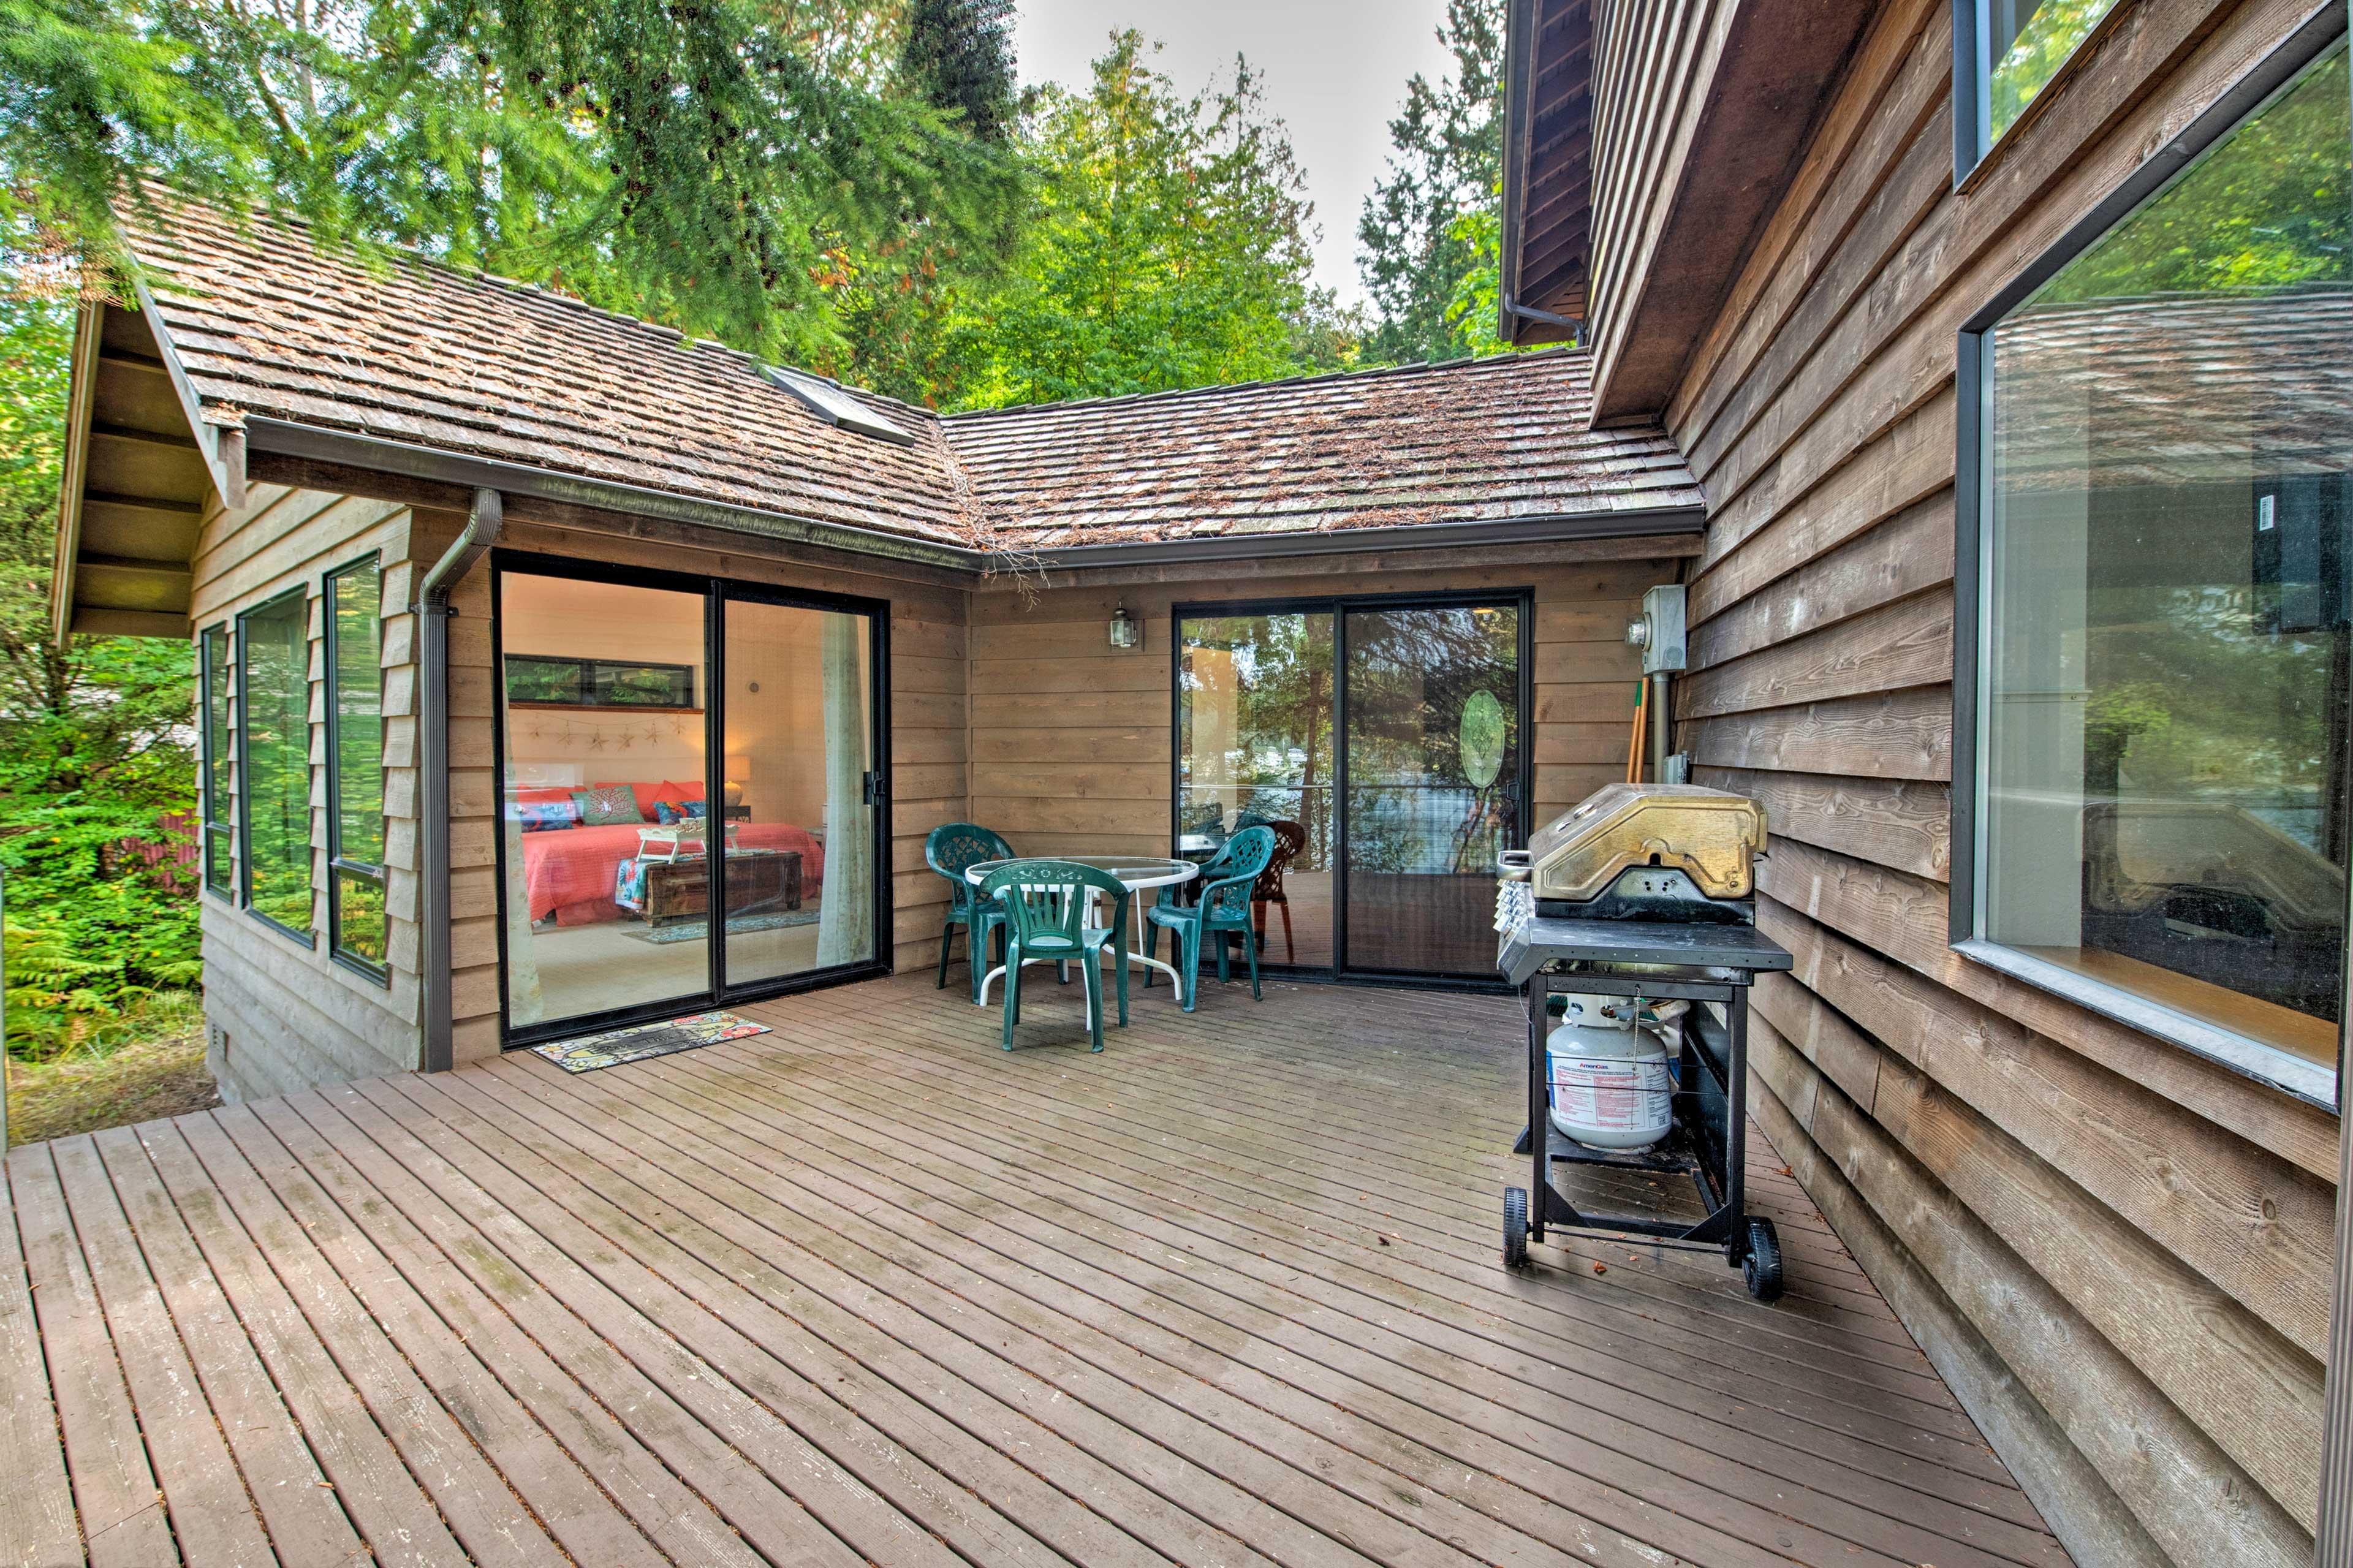 1st-Floor Wraparound Deck | Gas Grill | Dining Area